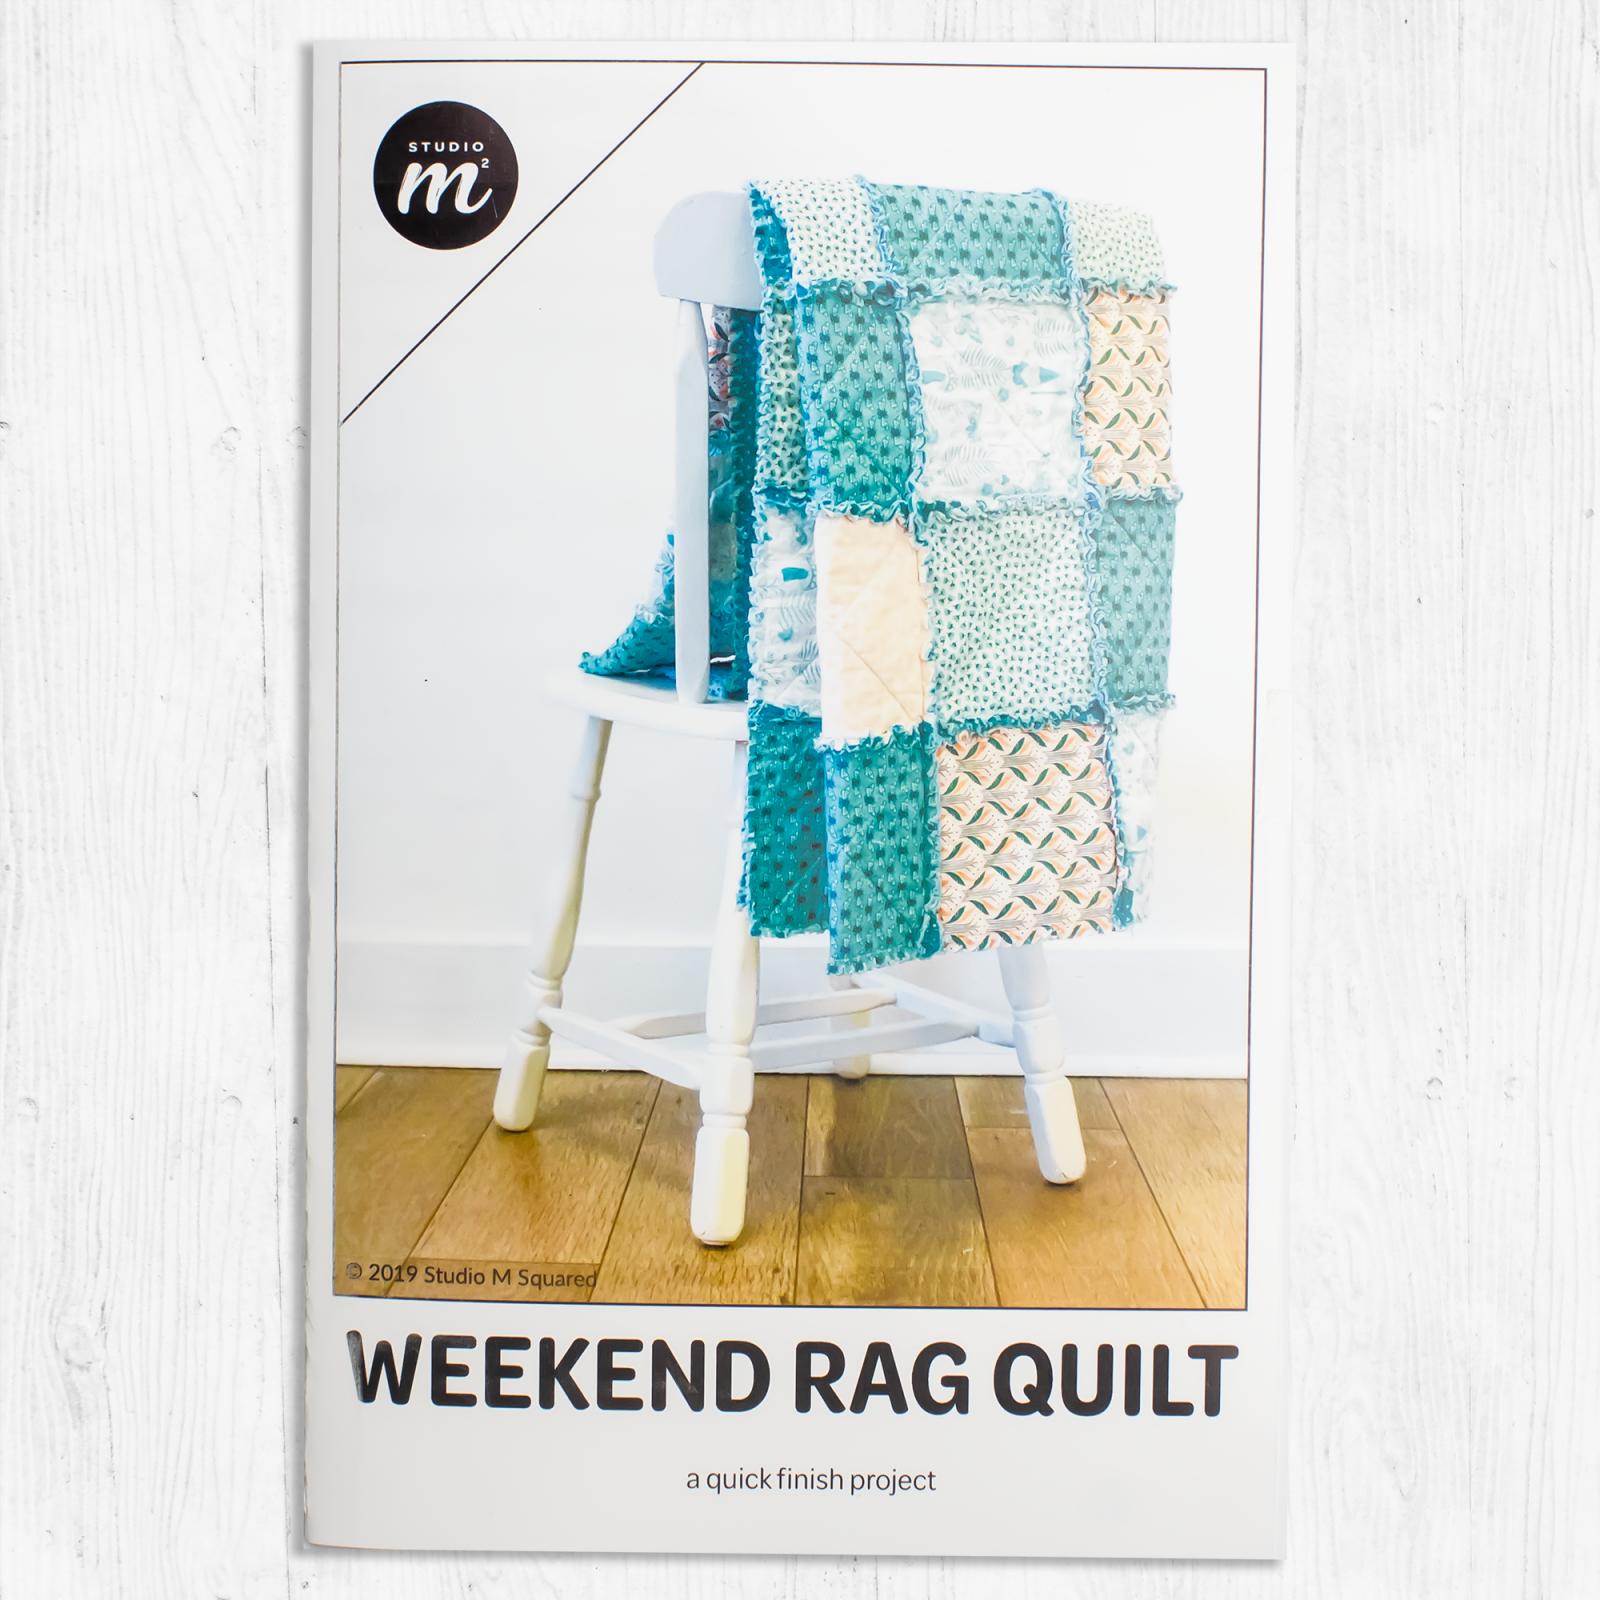 Studio M Squared - Weekend Rag Quilt